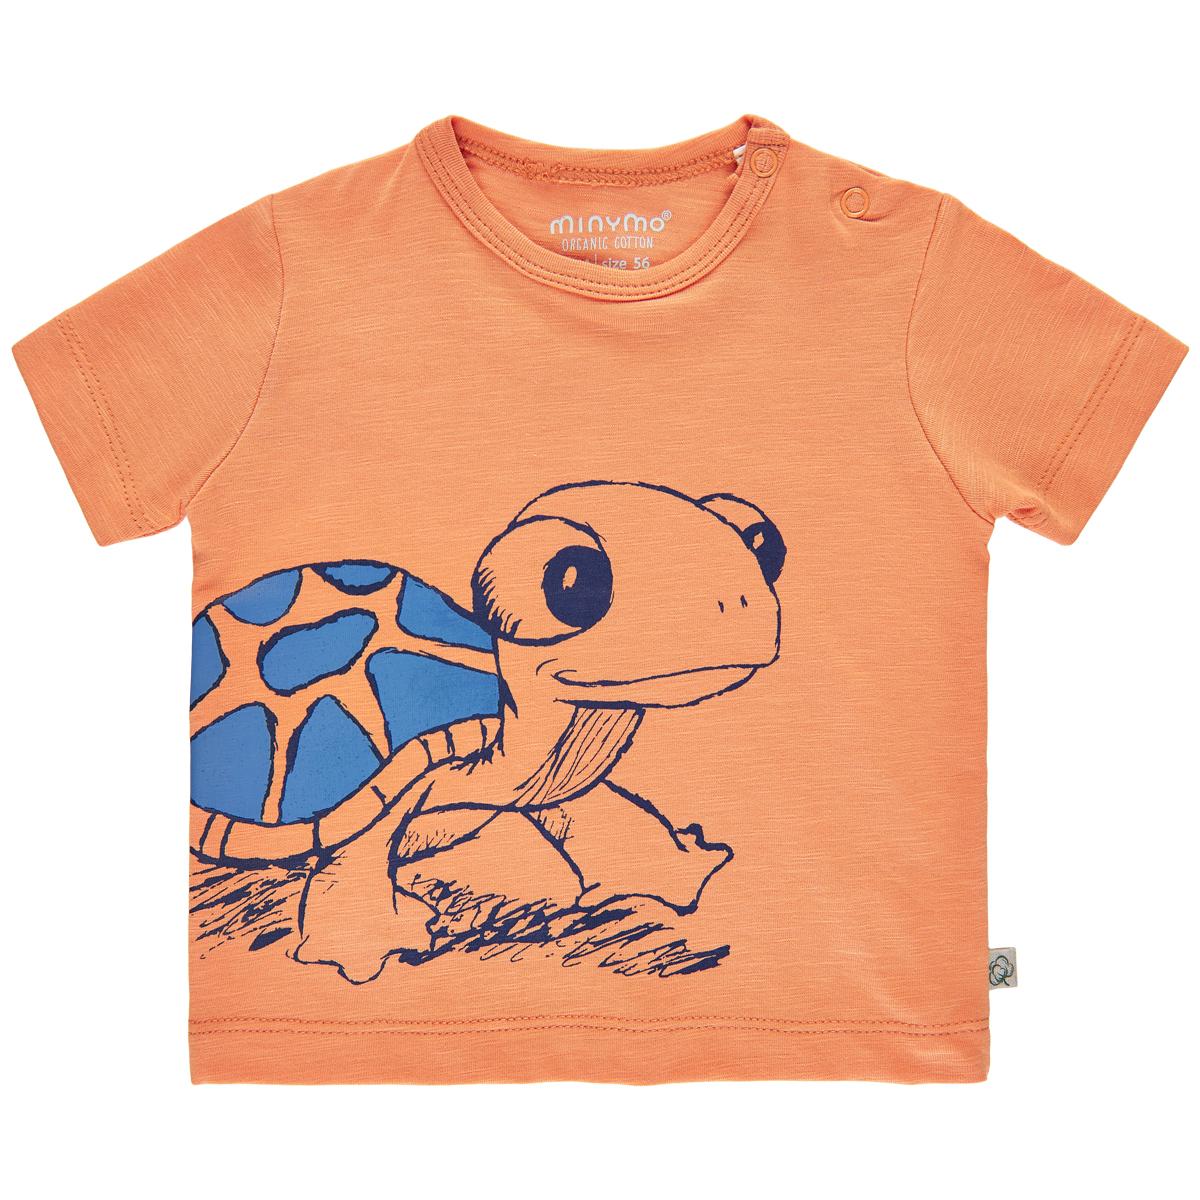 Minymo Baby Boy T-shirt Turtle GOTS Certified Copper Tan